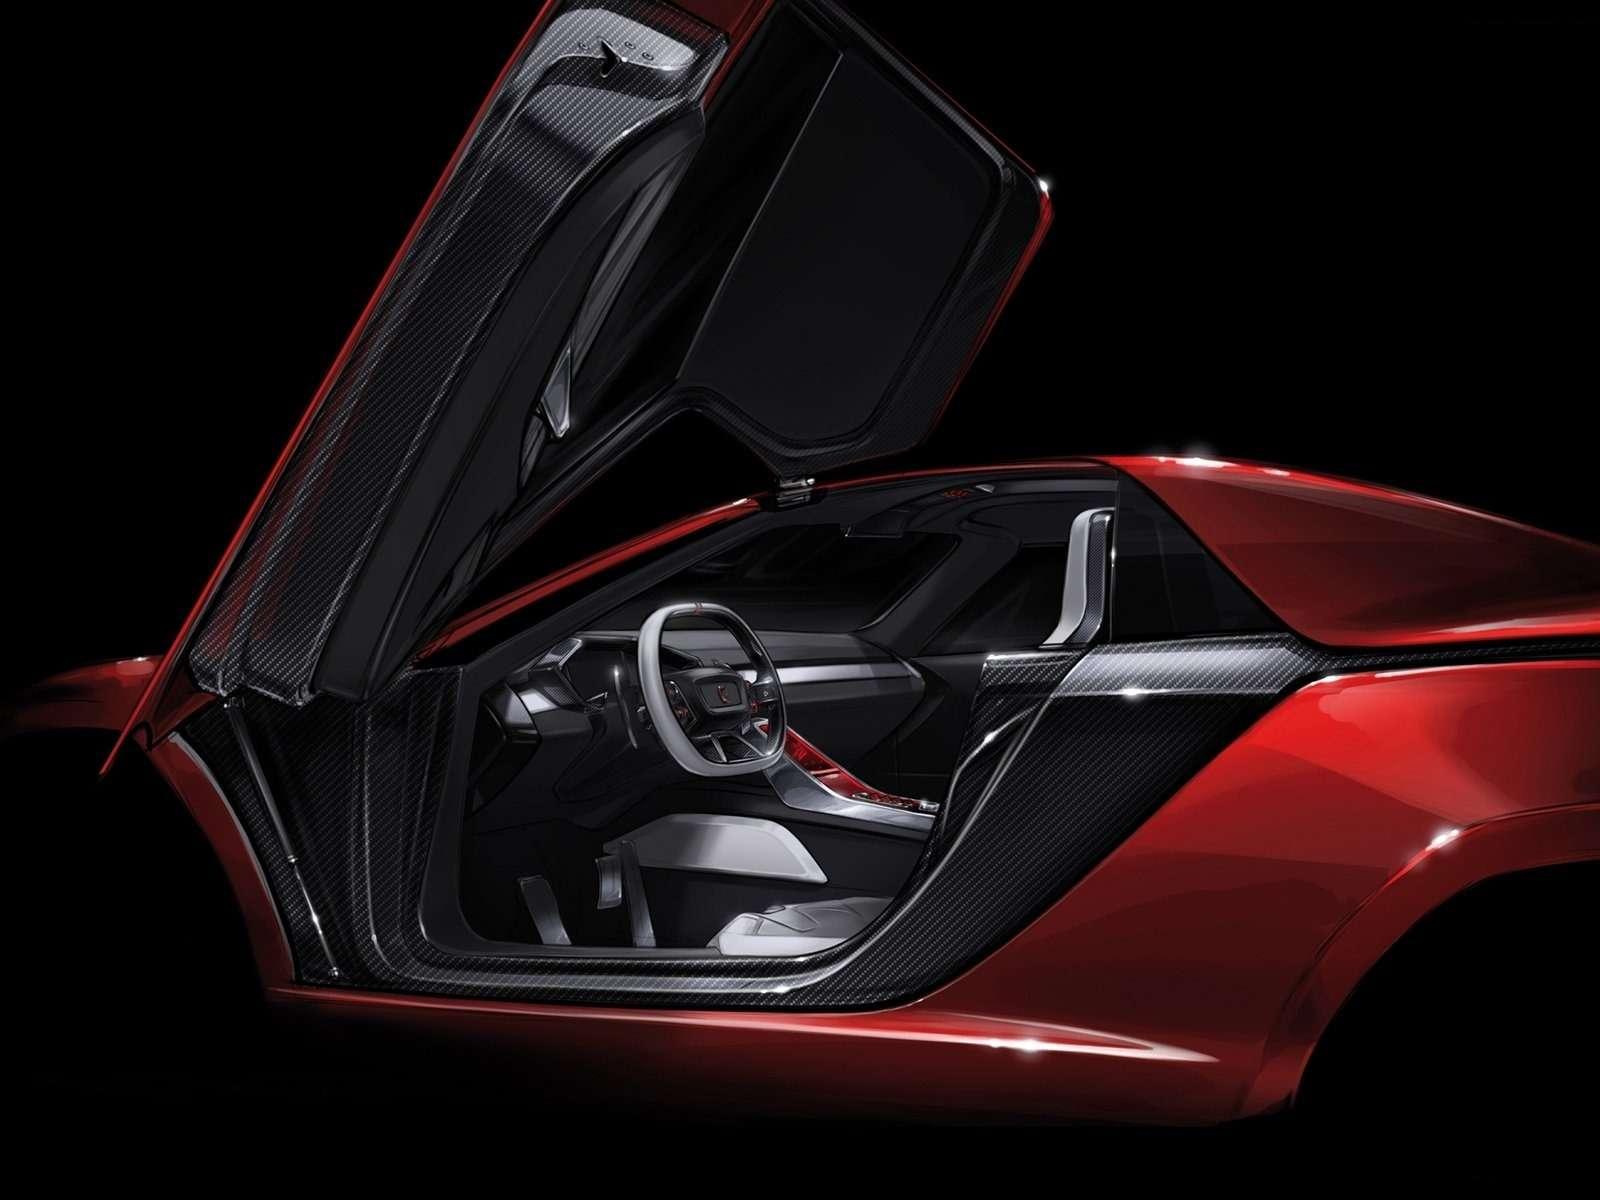 Lamborghini превратит Huracan вовнедорожник— фото 787756